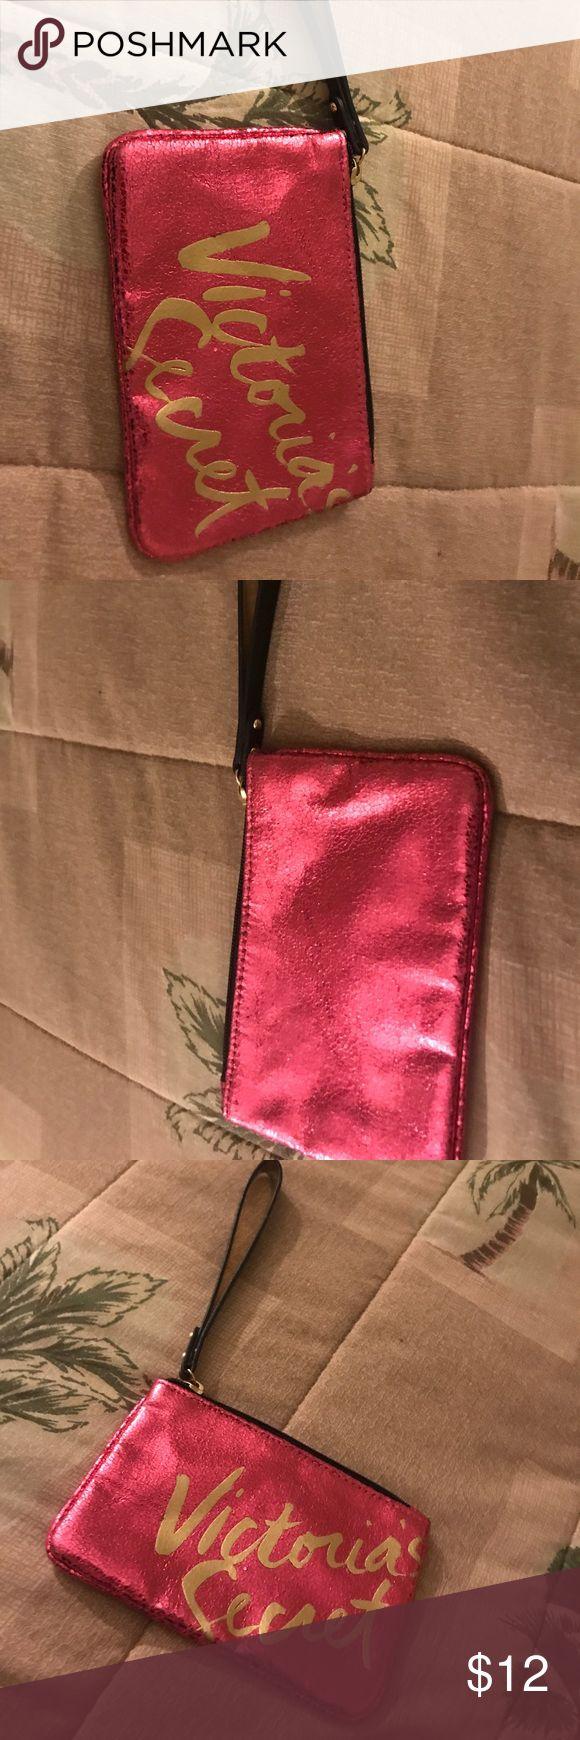 Victoria secret clutch Pink small Victoria secret clutch Victoria's Secret Bags Clutches & Wristlets